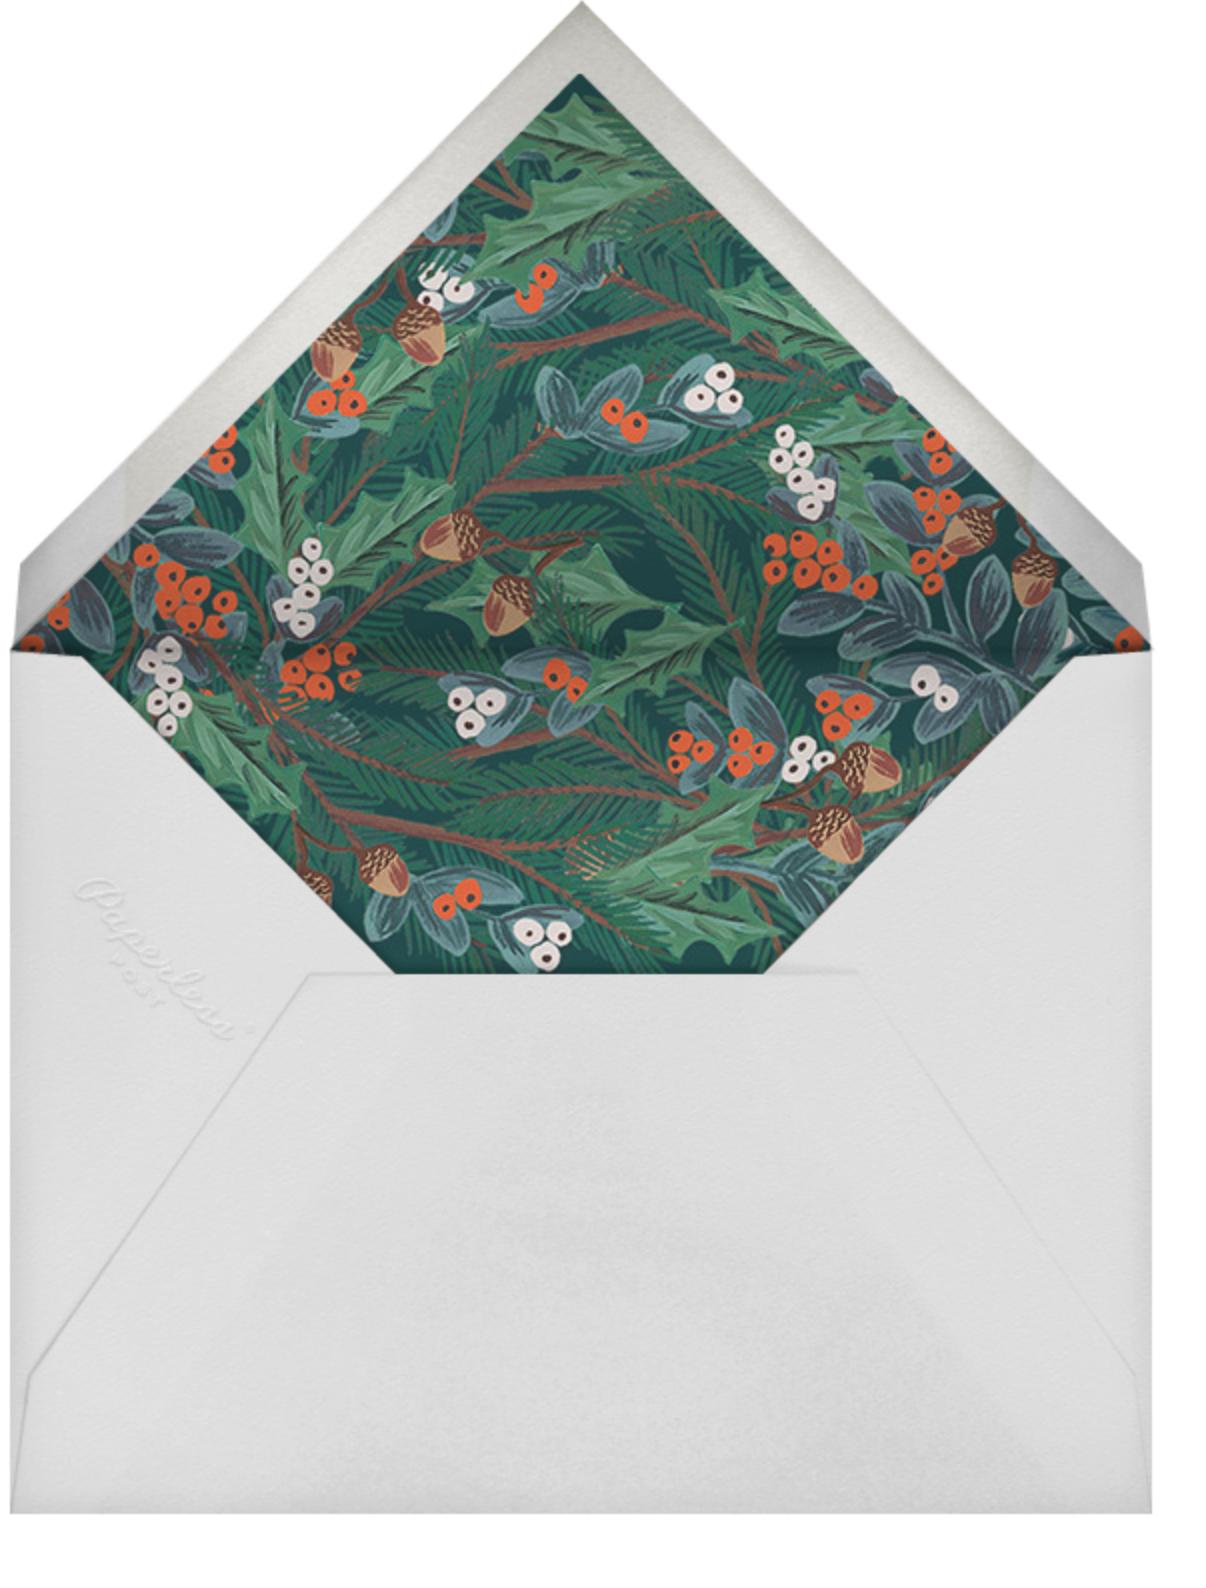 Winter Foliage (Invitation) - Rifle Paper Co. - Winter entertaining - envelope back